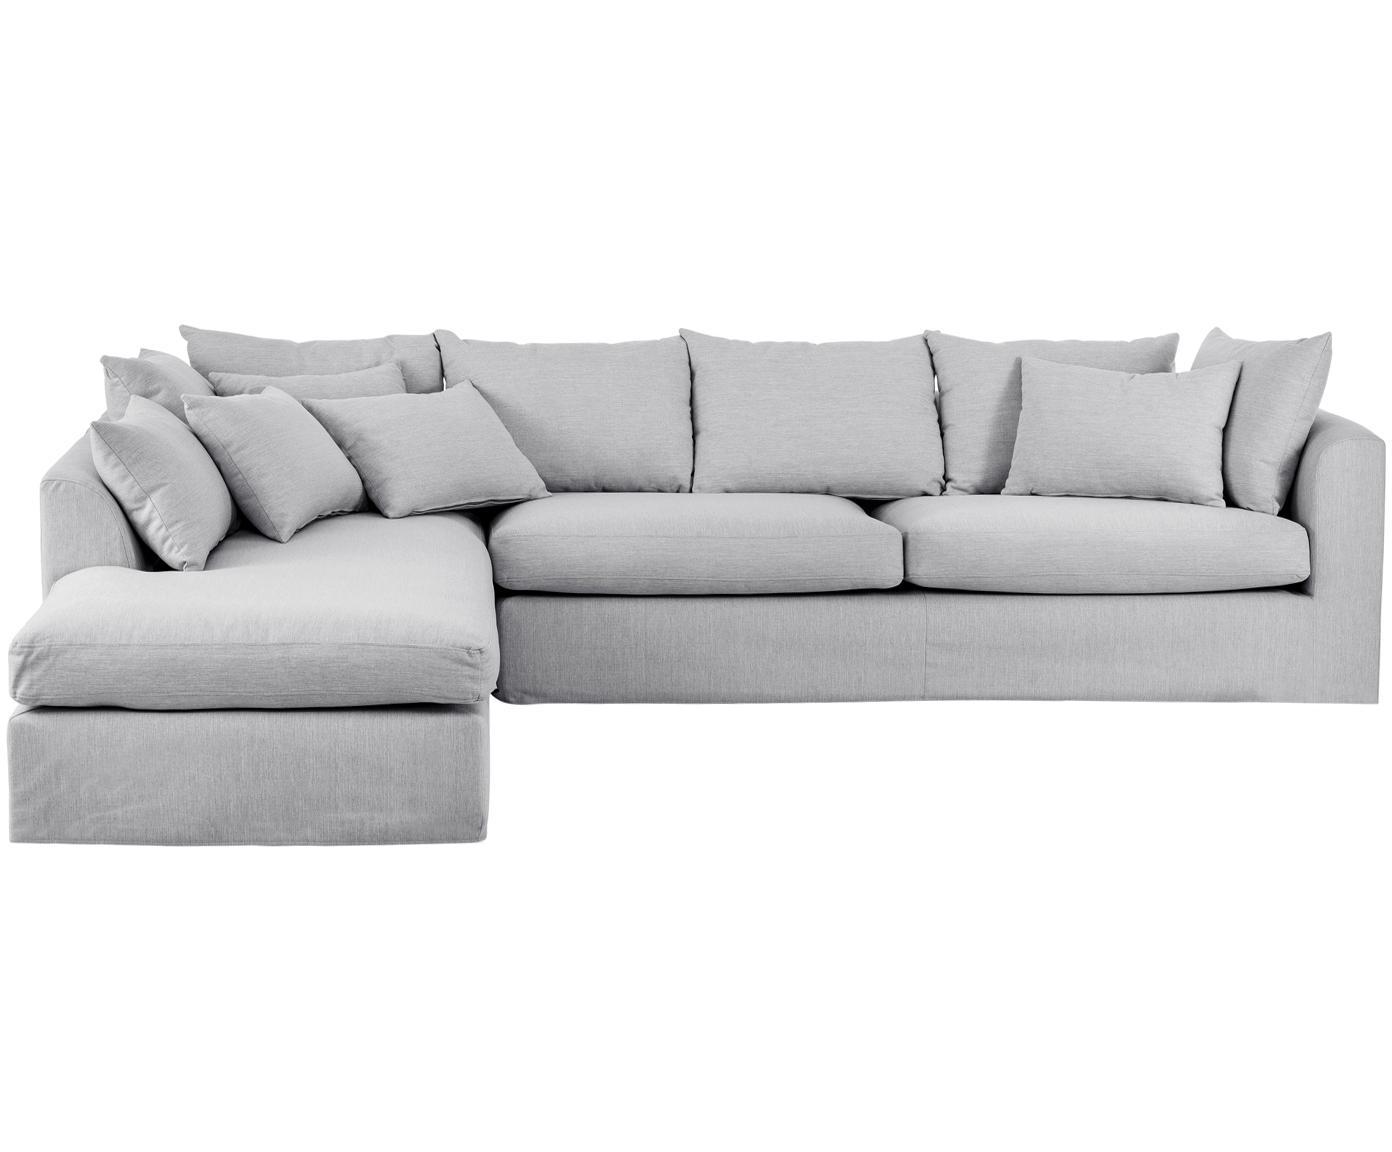 Ecksofa Zach, Bezug: Polypropylen, Füße: Kunststoff, Webstoff Grau, B 300 x T 213 cm